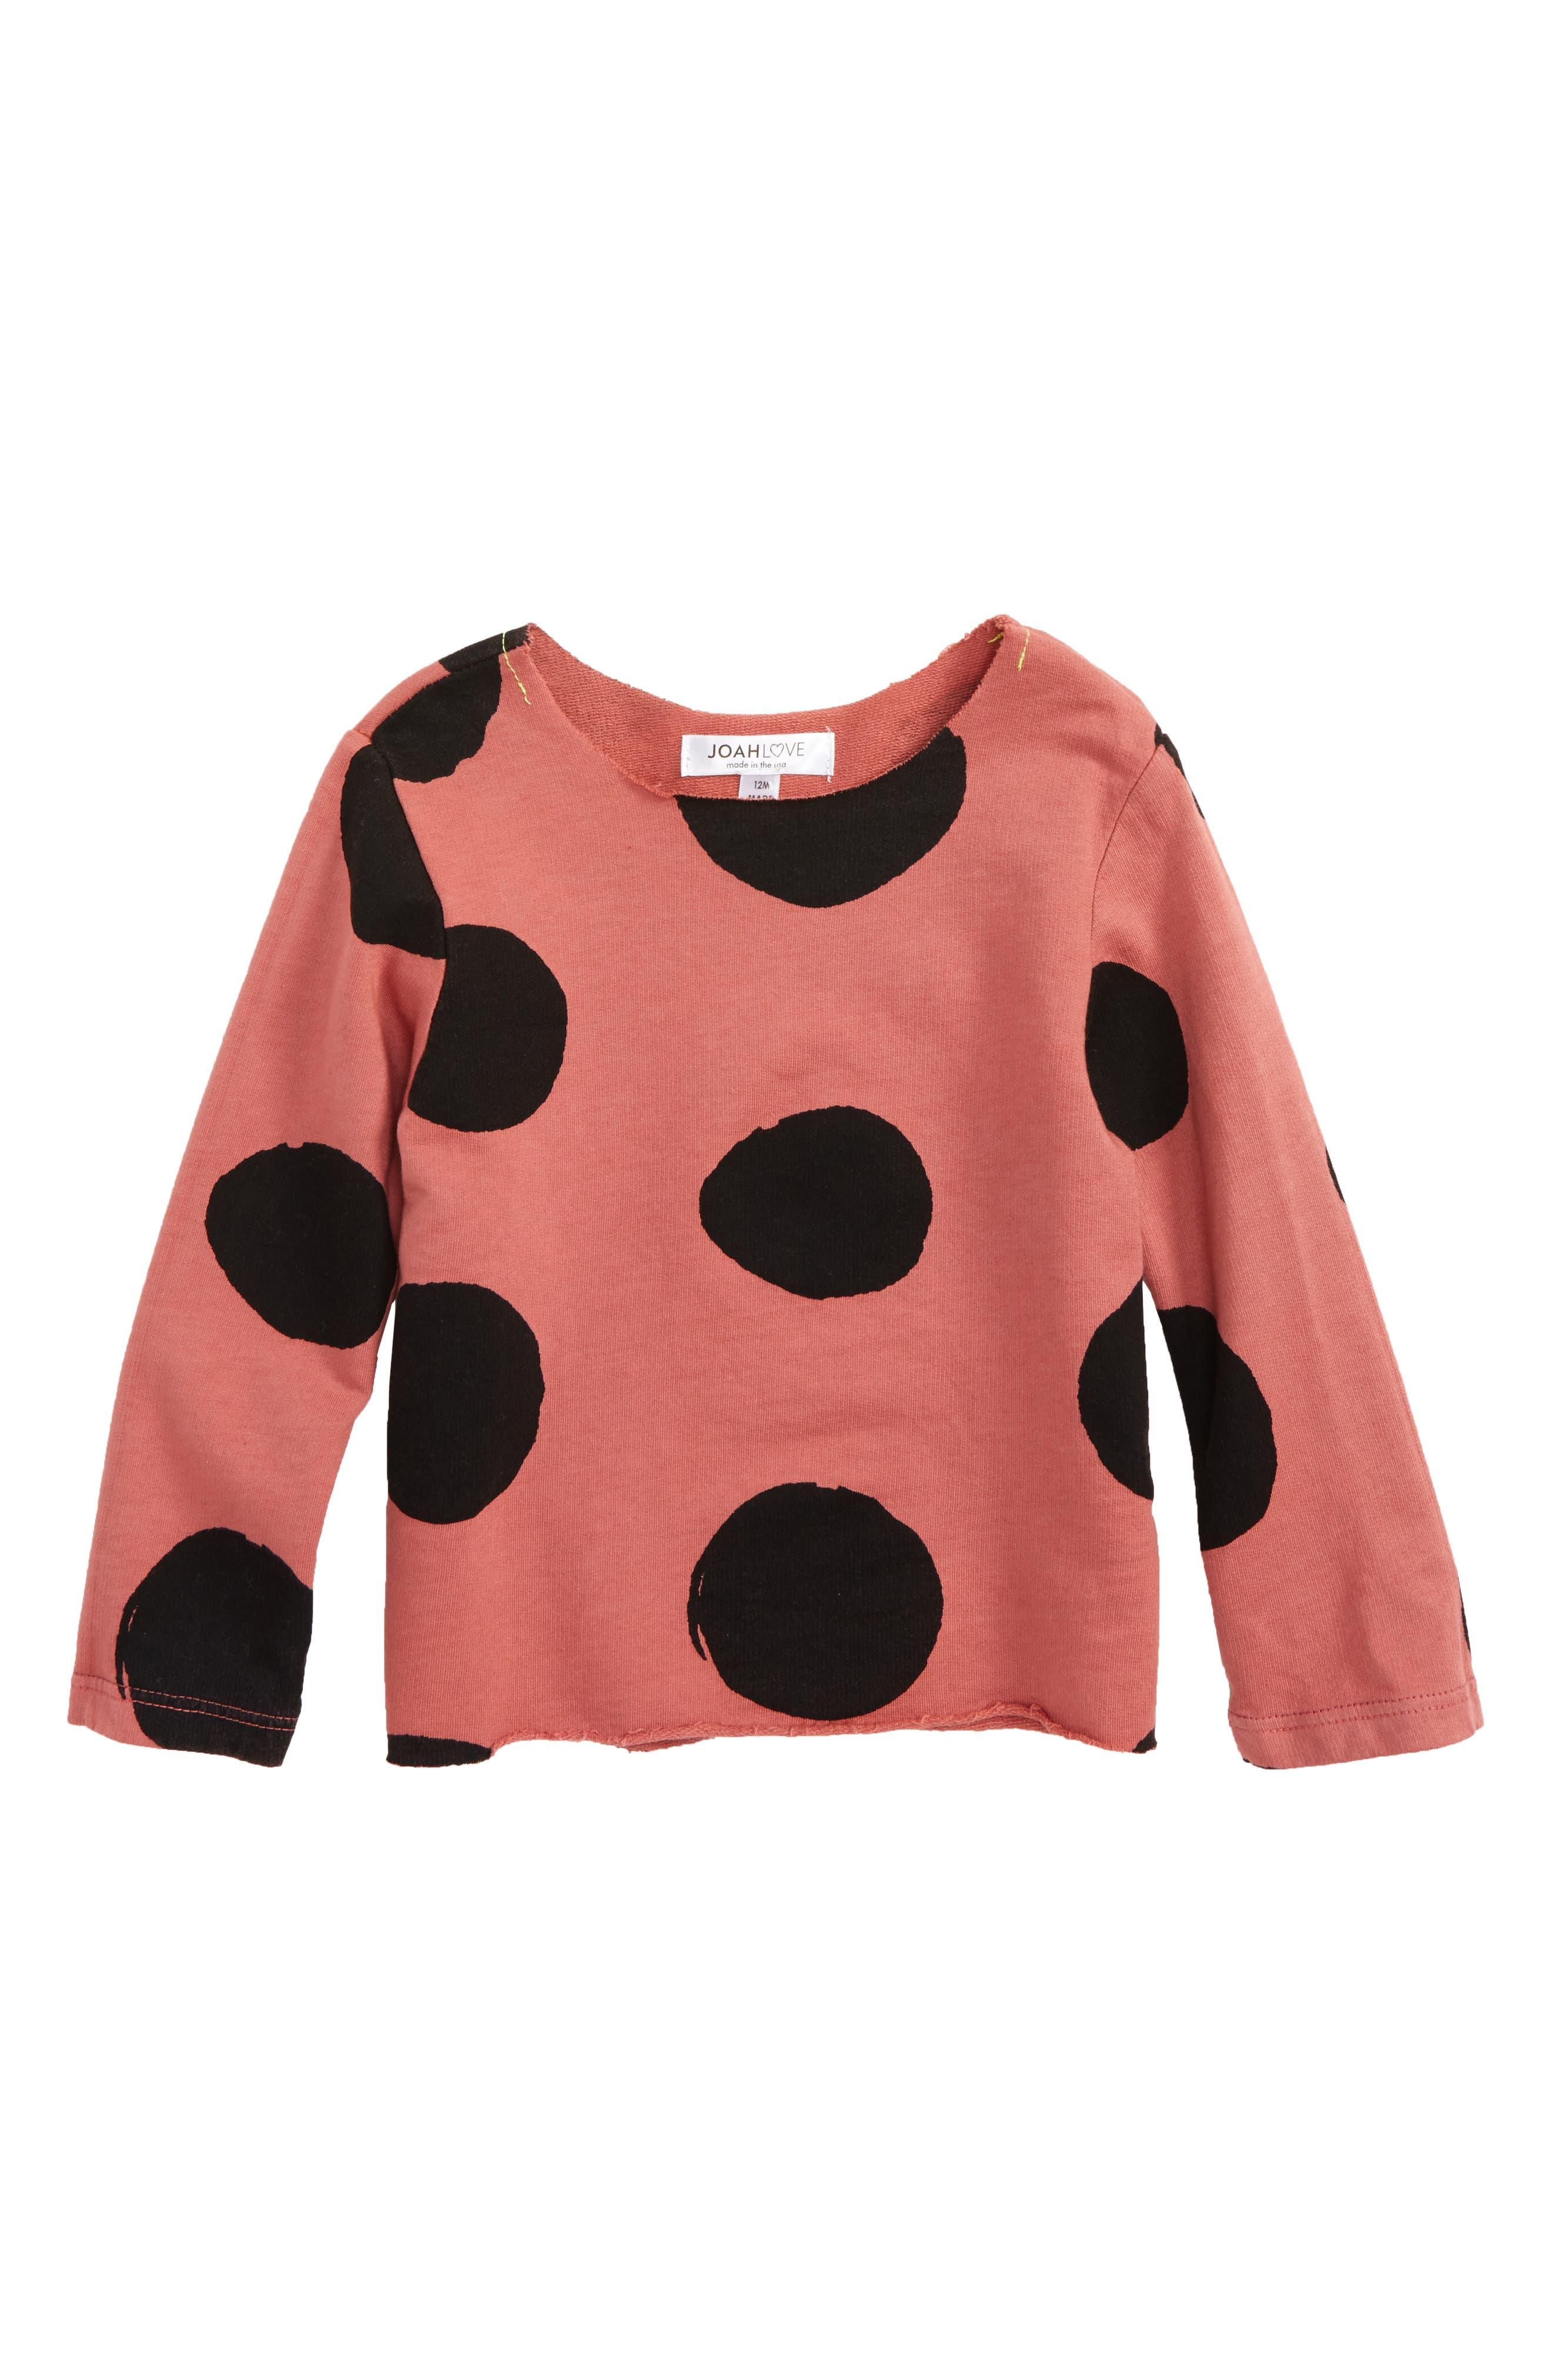 Dot Sweatshirt,                         Main,                         color, 600